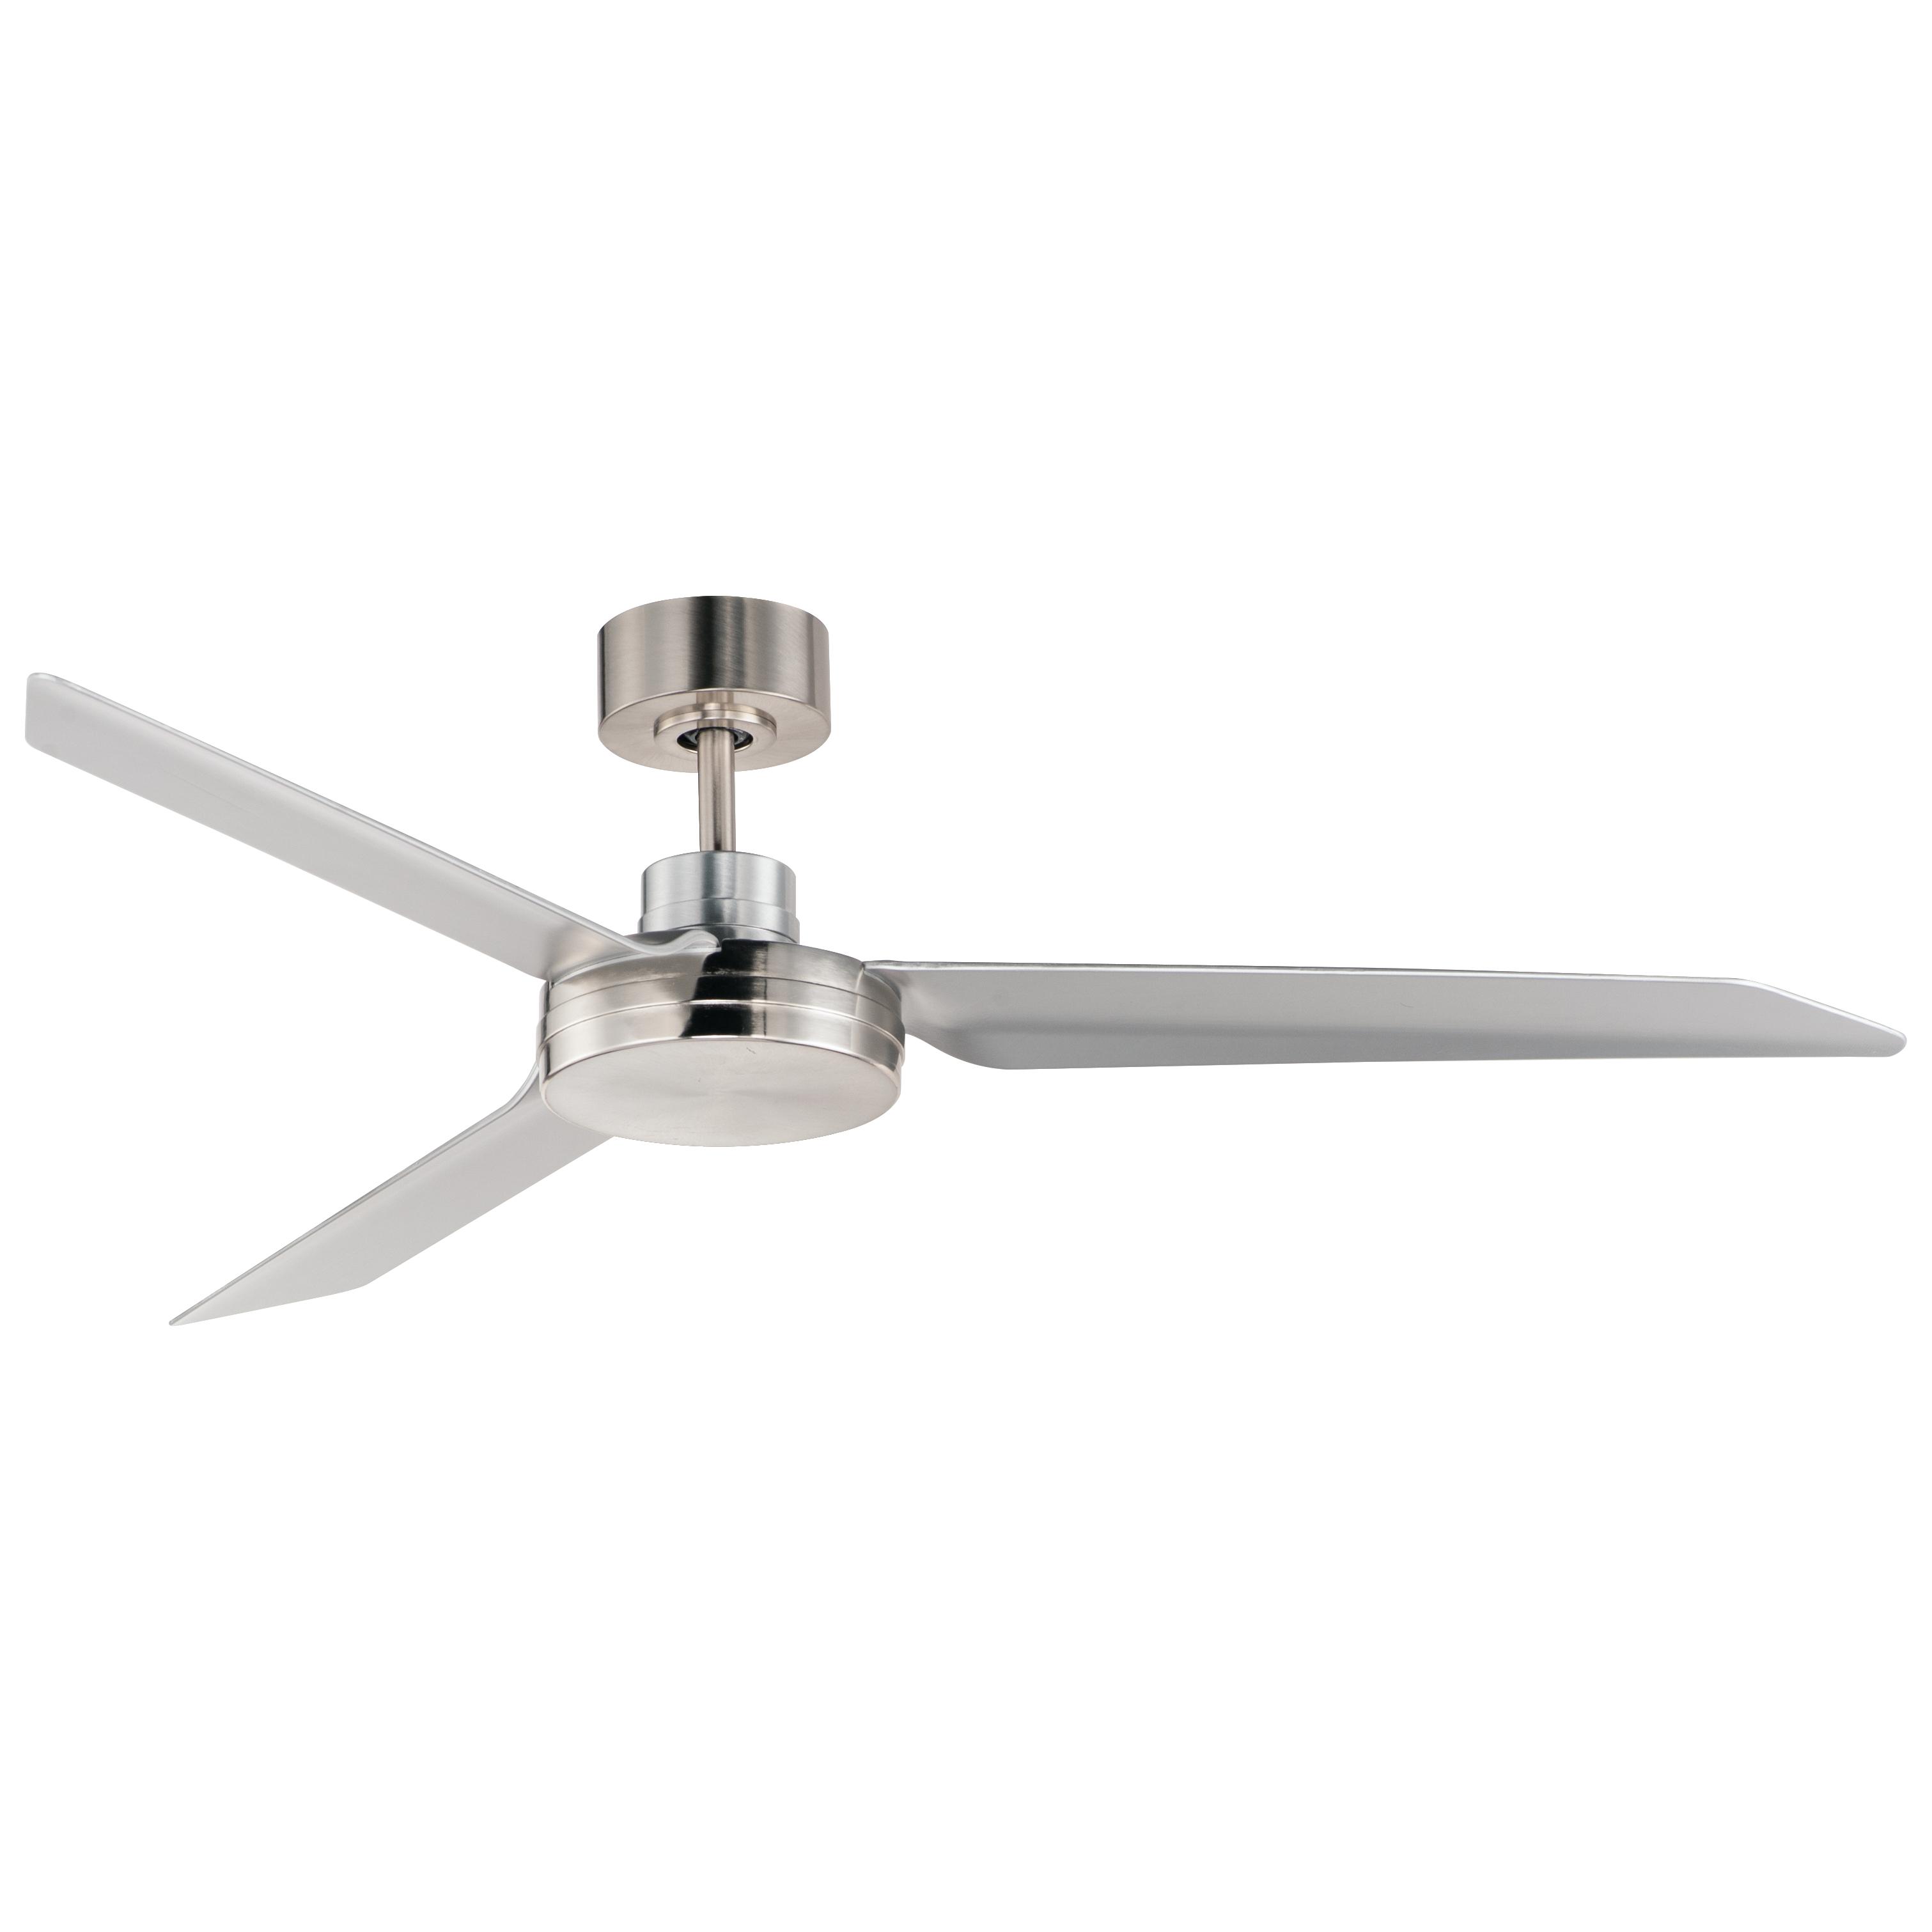 Ultra Slim 52-inch Outdoor Fan Nickel | Maxim Lighting